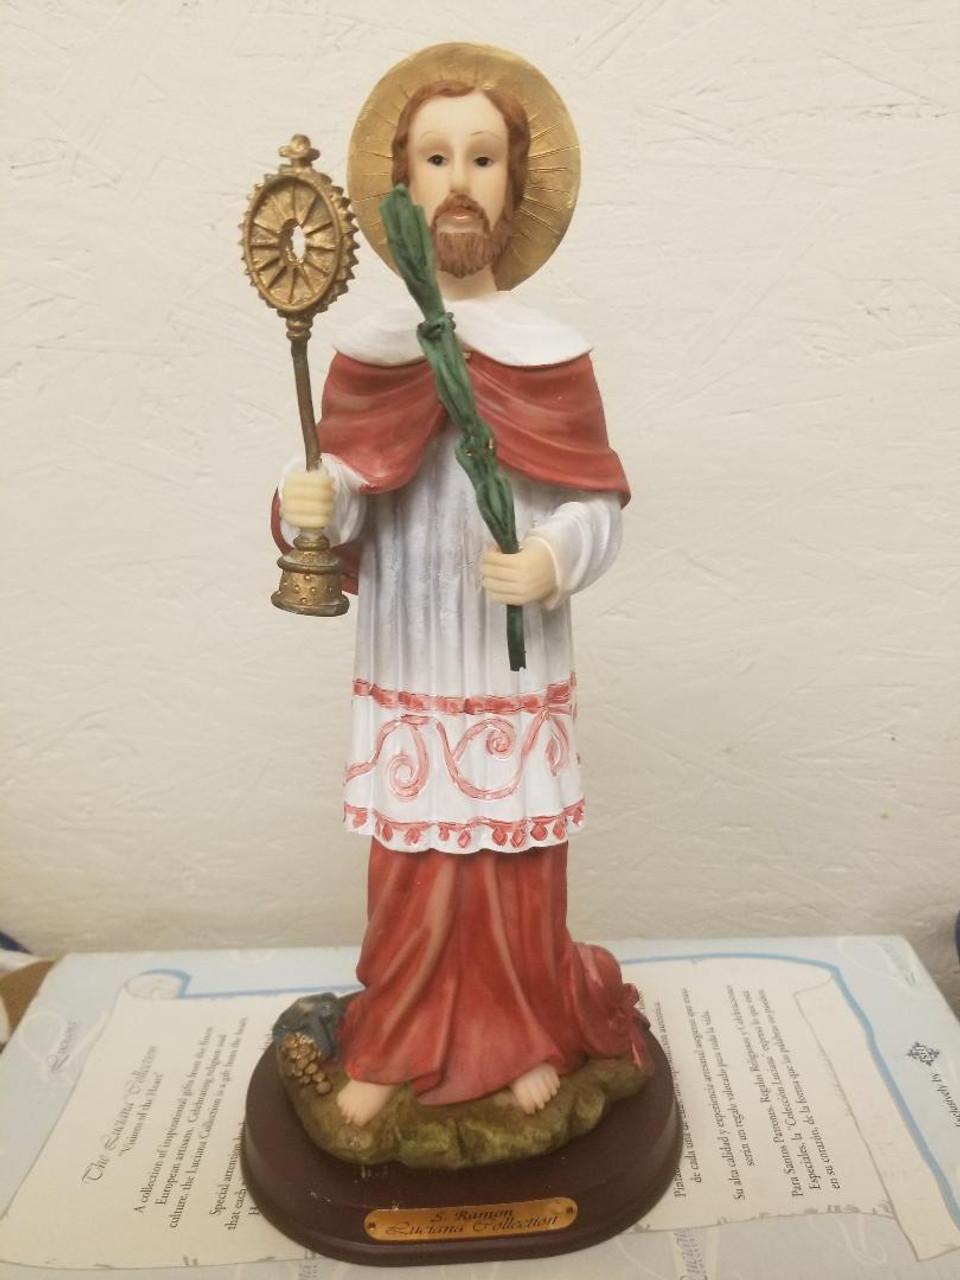 Saint Raymond Statue 12 inches